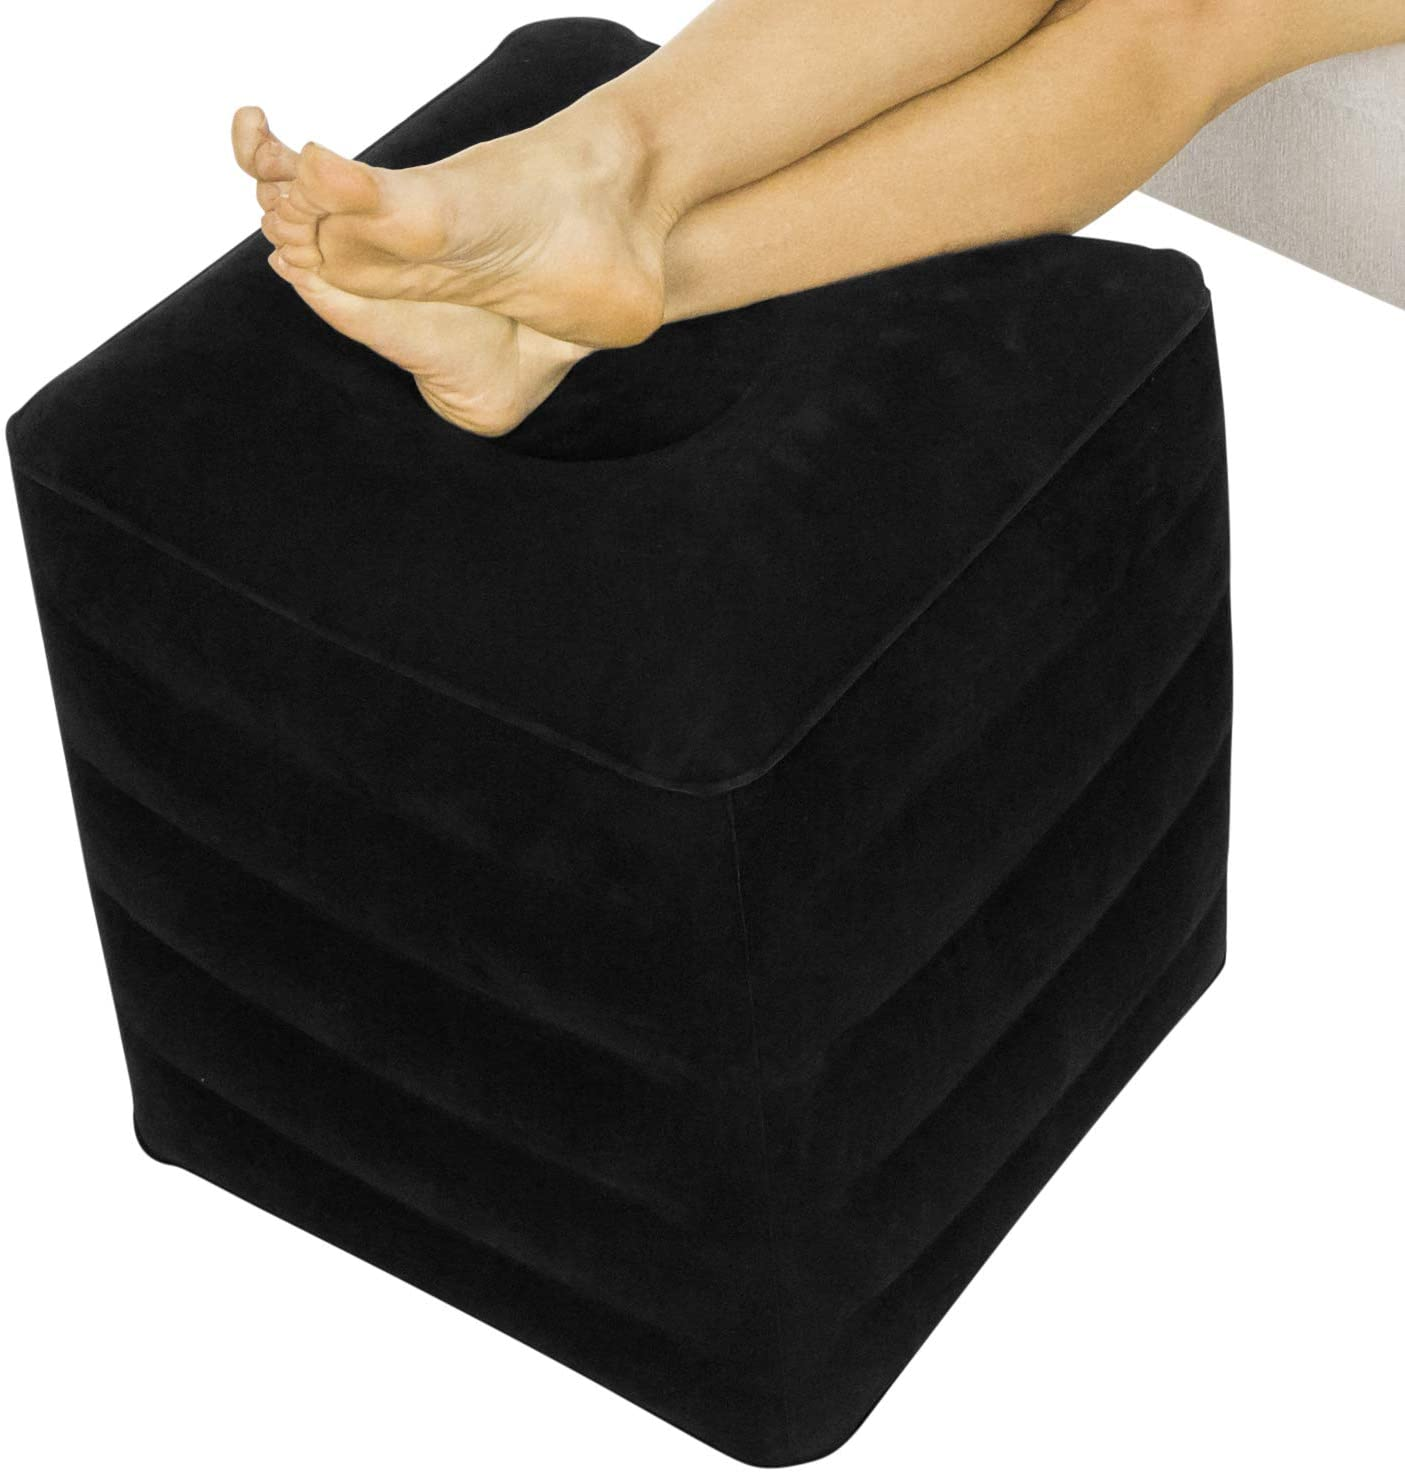 Xtra-Comfort Inflatable Ottoman